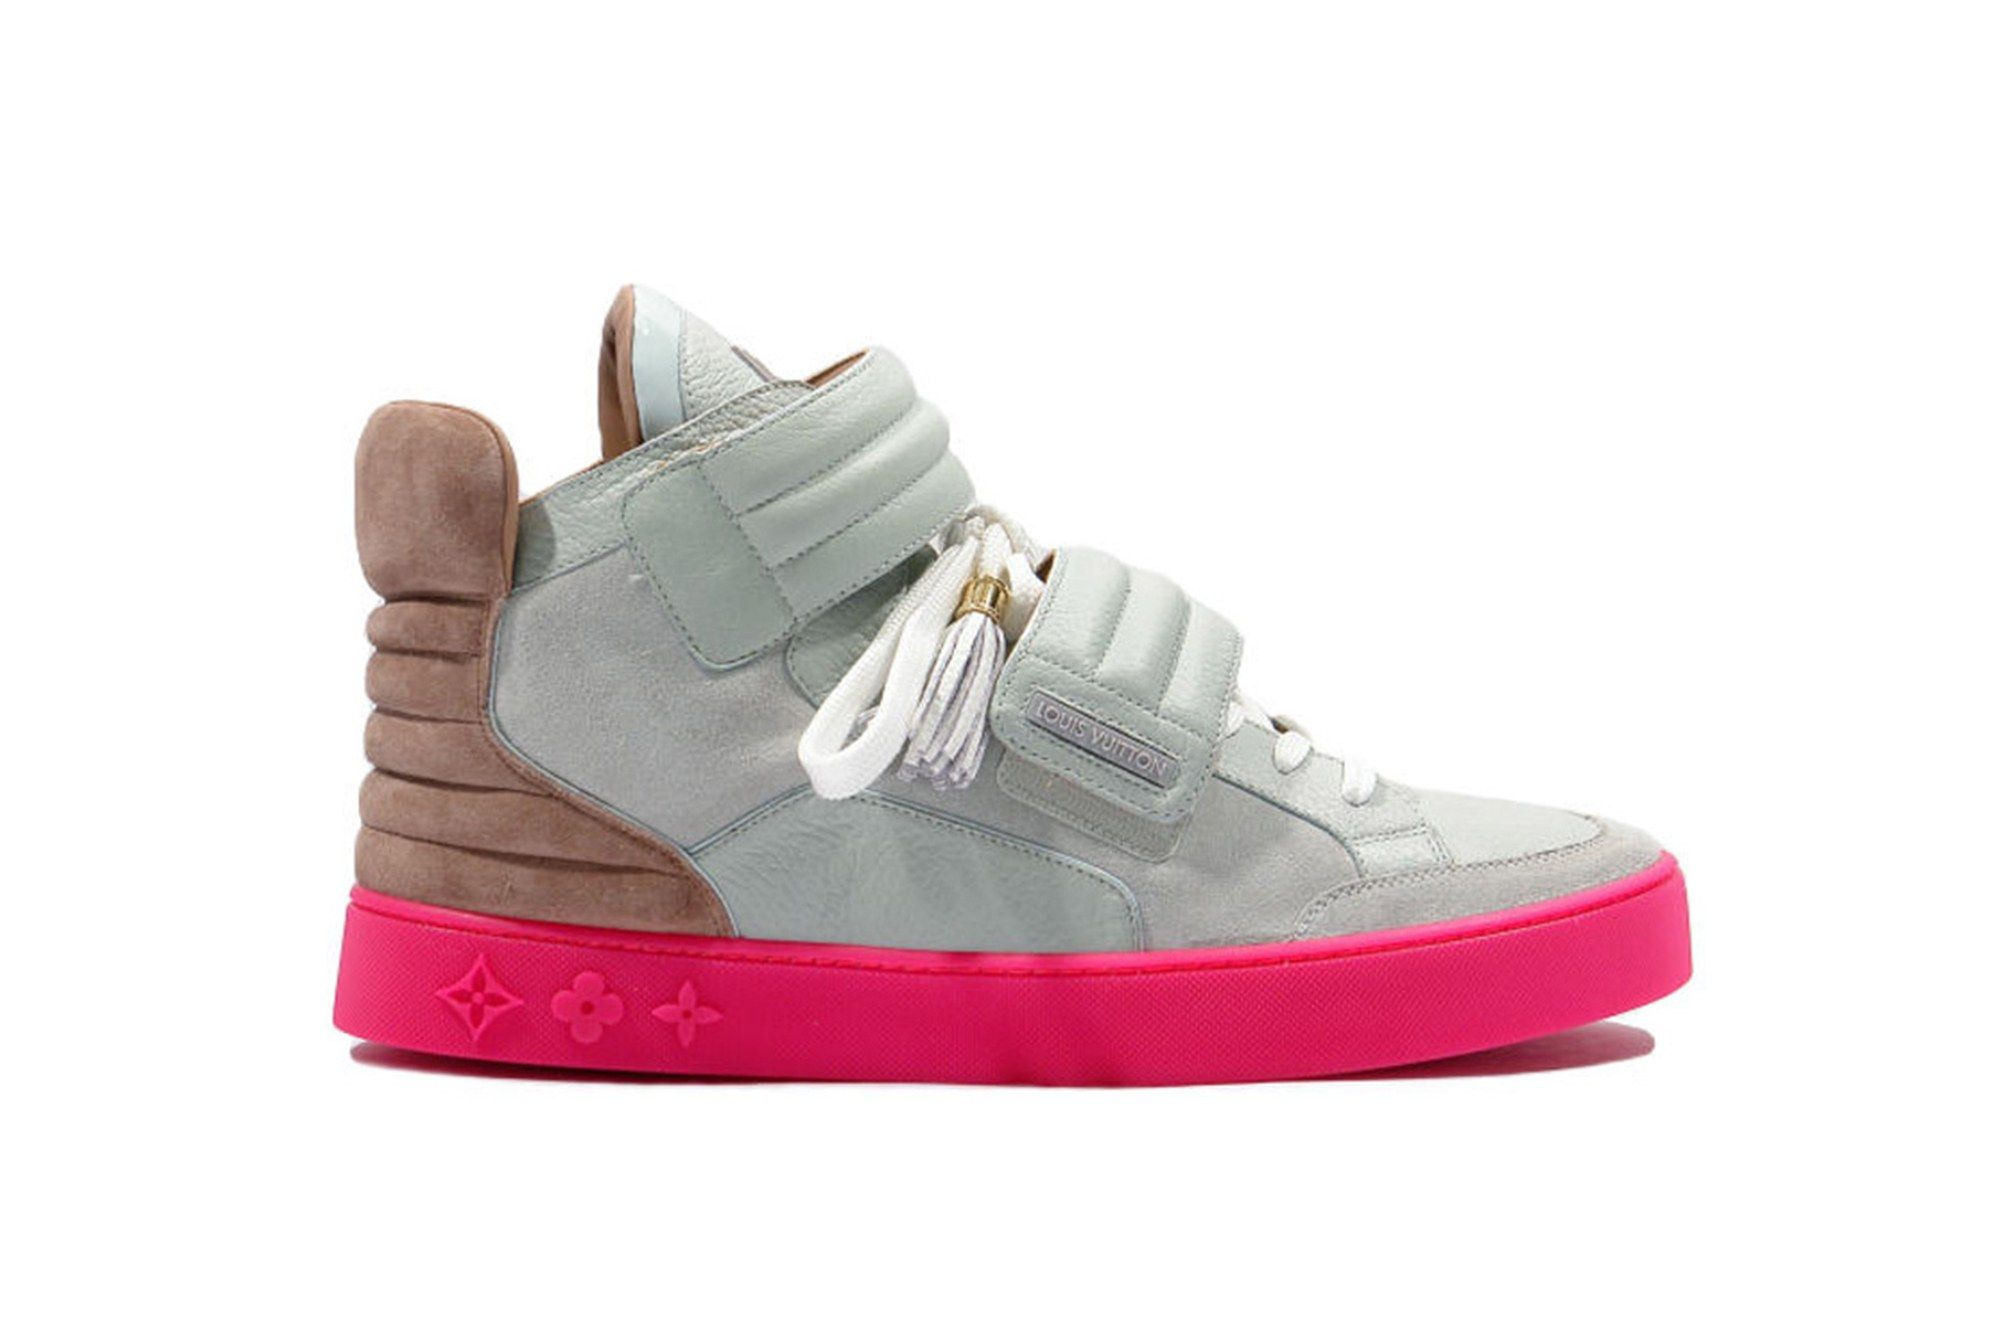 Every Sneaker Kanye West Ever Designed